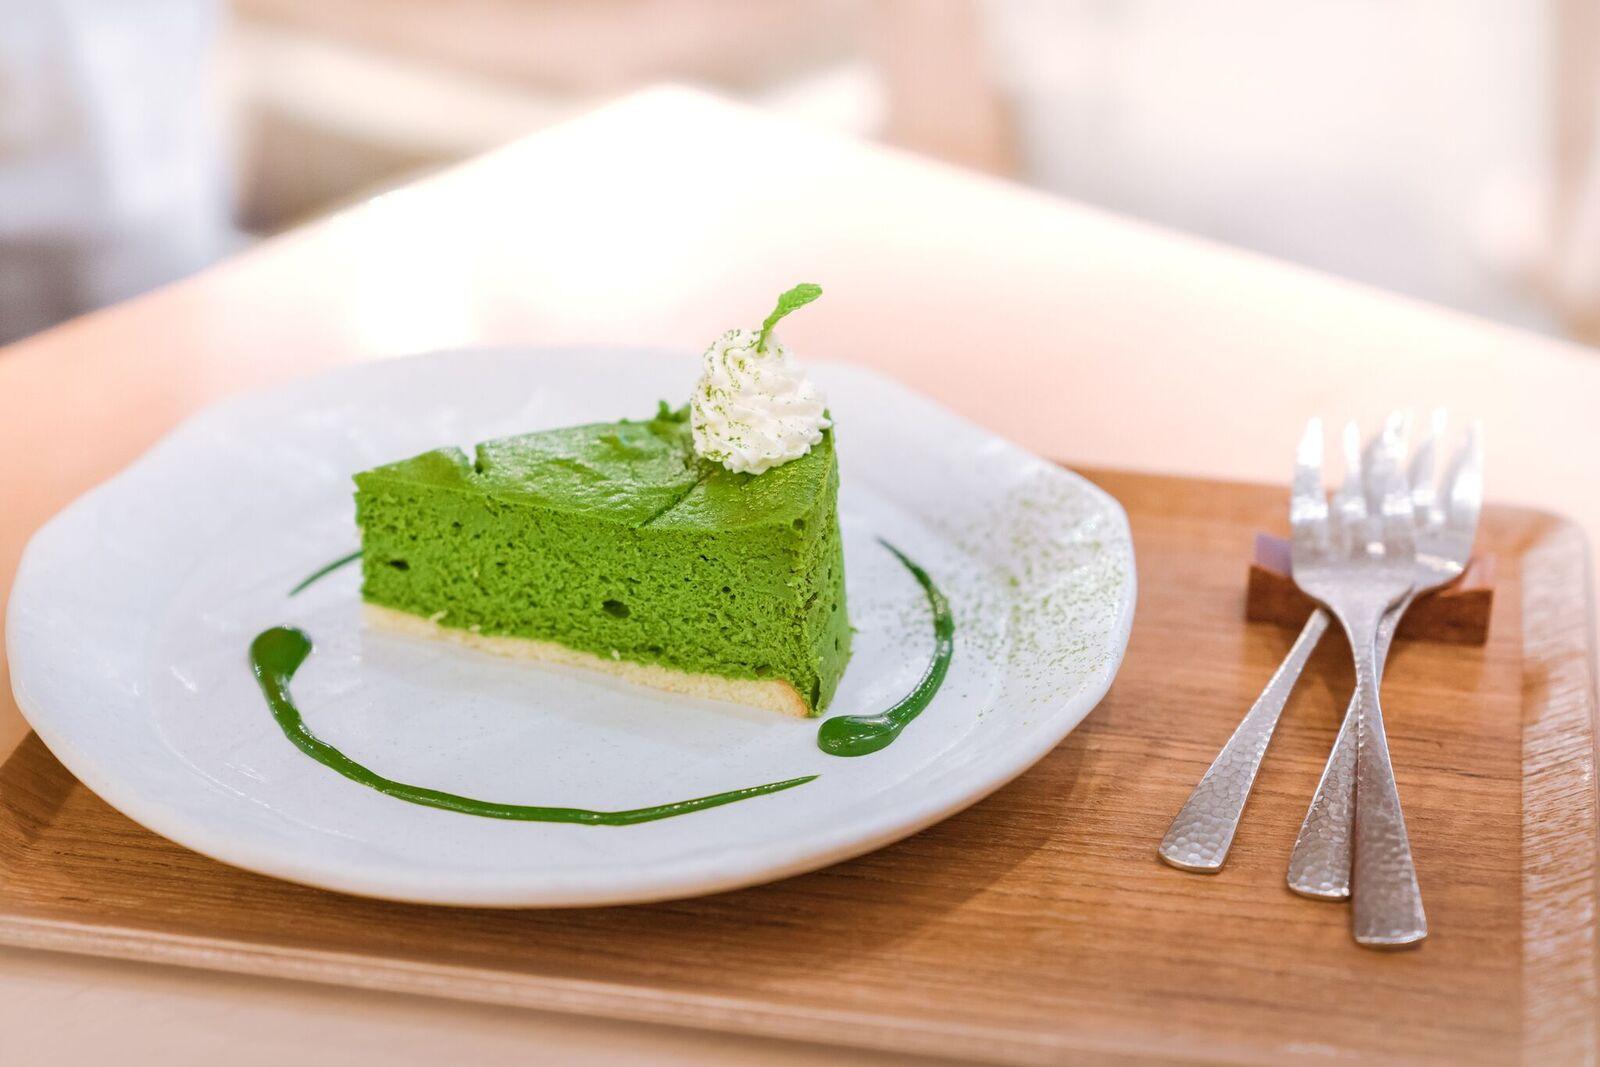 Matcha Green Tea Cheesecake